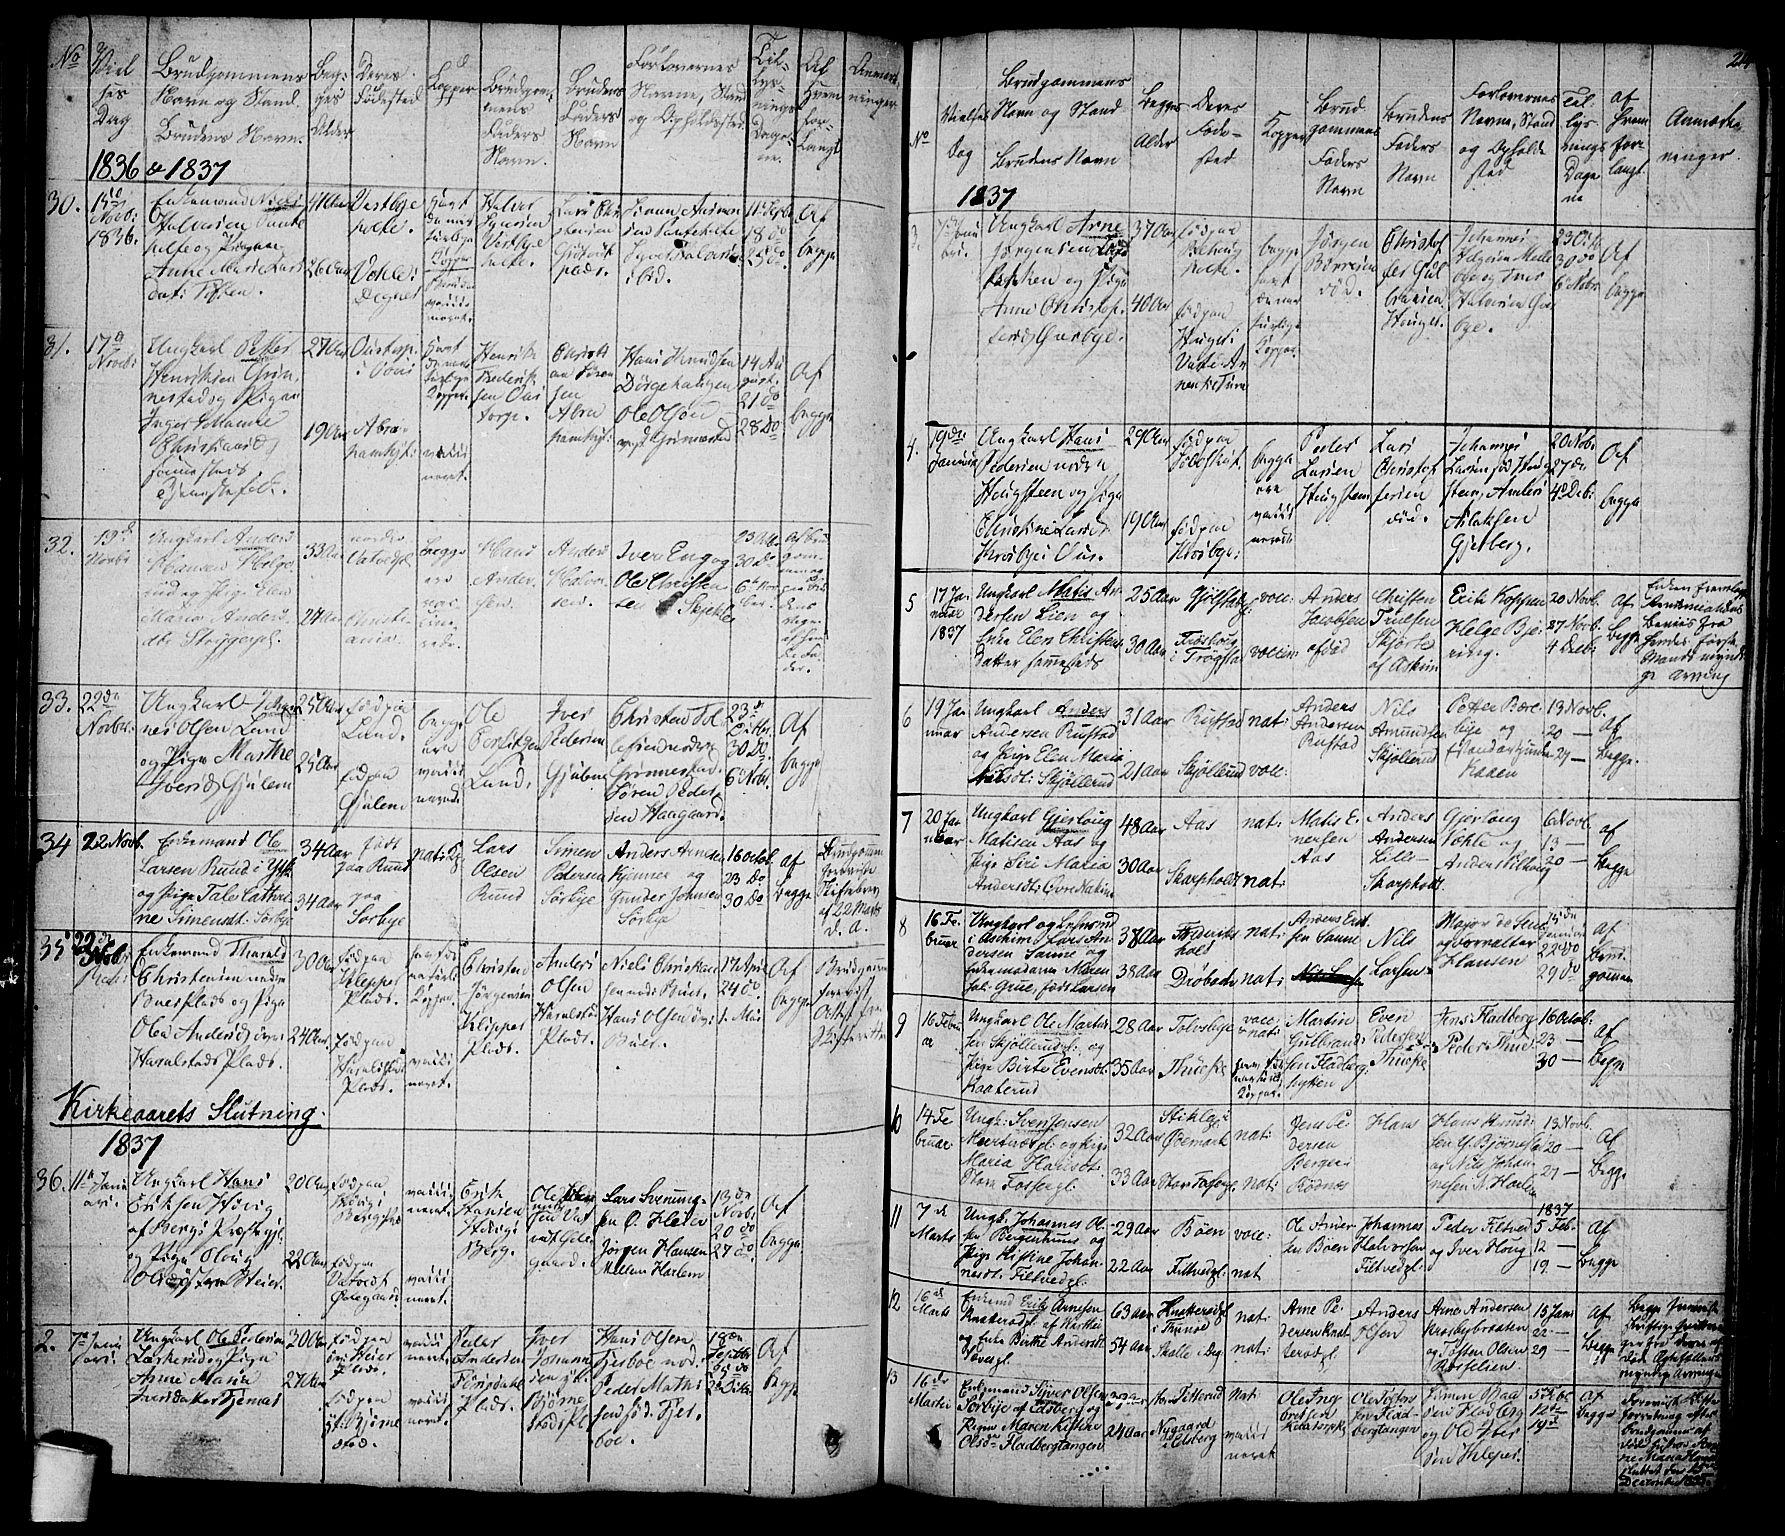 SAO, Rakkestad prestekontor Kirkebøker, F/Fa/L0007: Ministerialbok nr. I 7, 1825-1841, s. 214